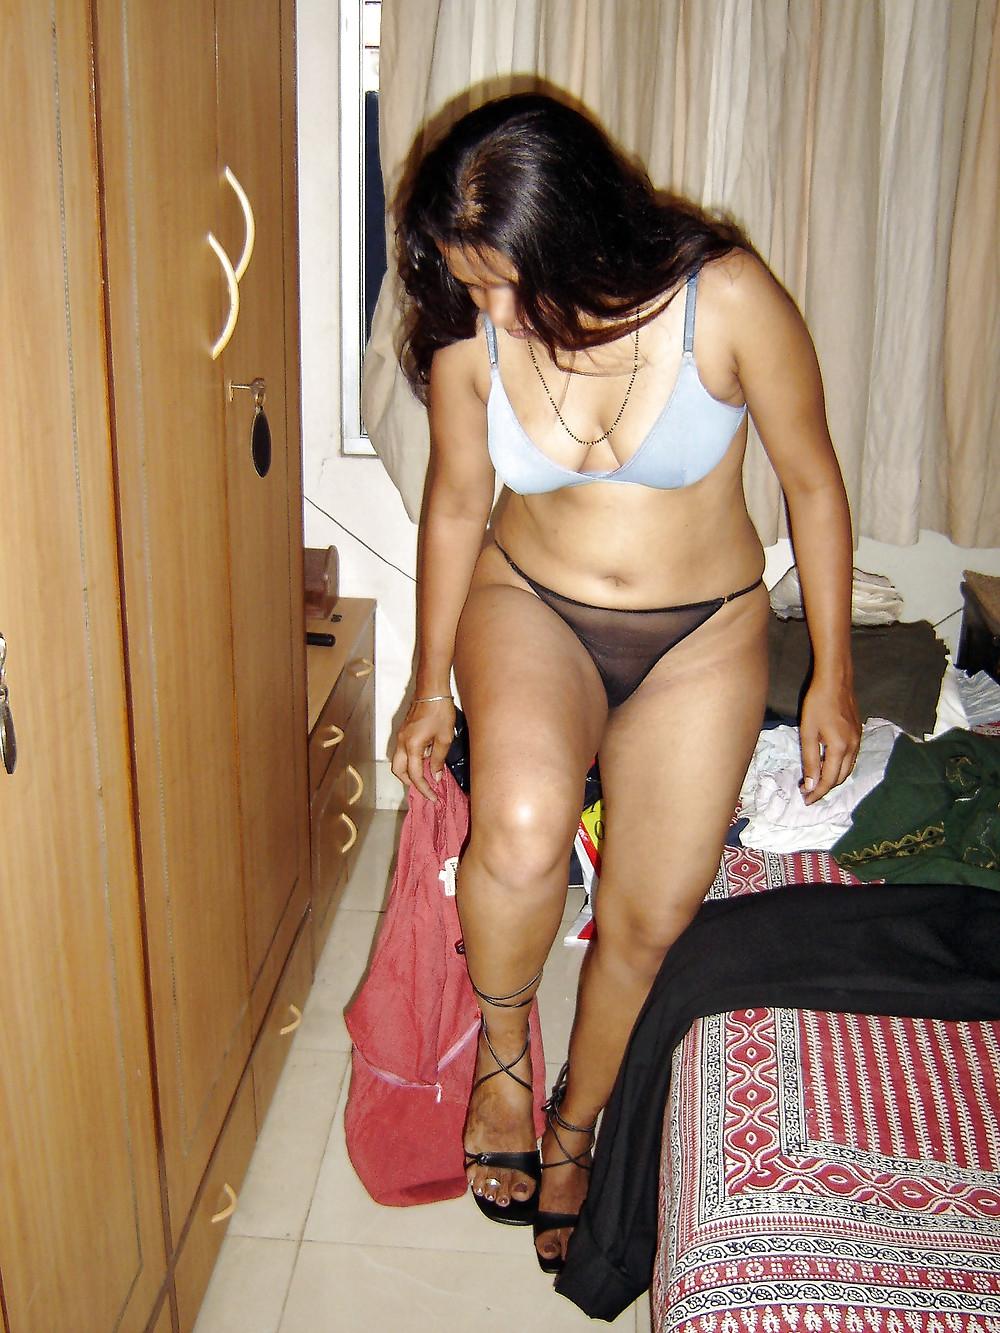 desibin nude ... Mumbai Slutty MILF Nude Photos During Europe Tour - N ...